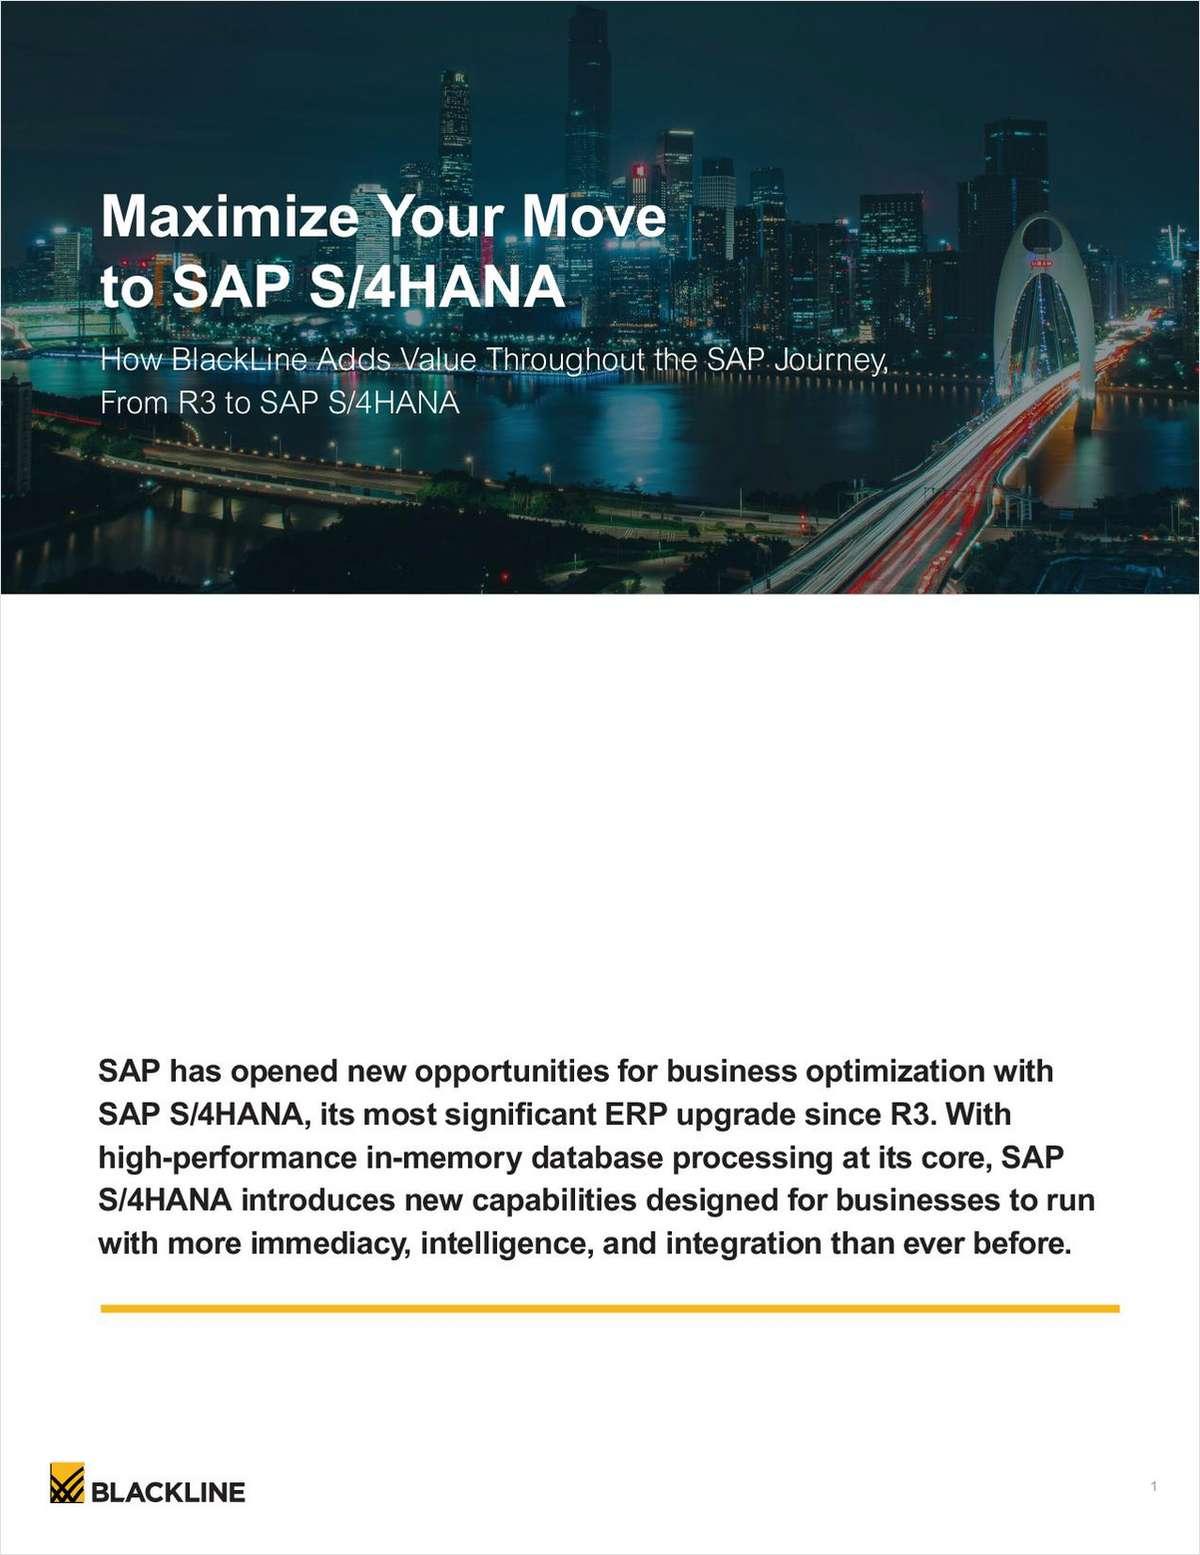 Maximize your Move to SAP S/4HANA